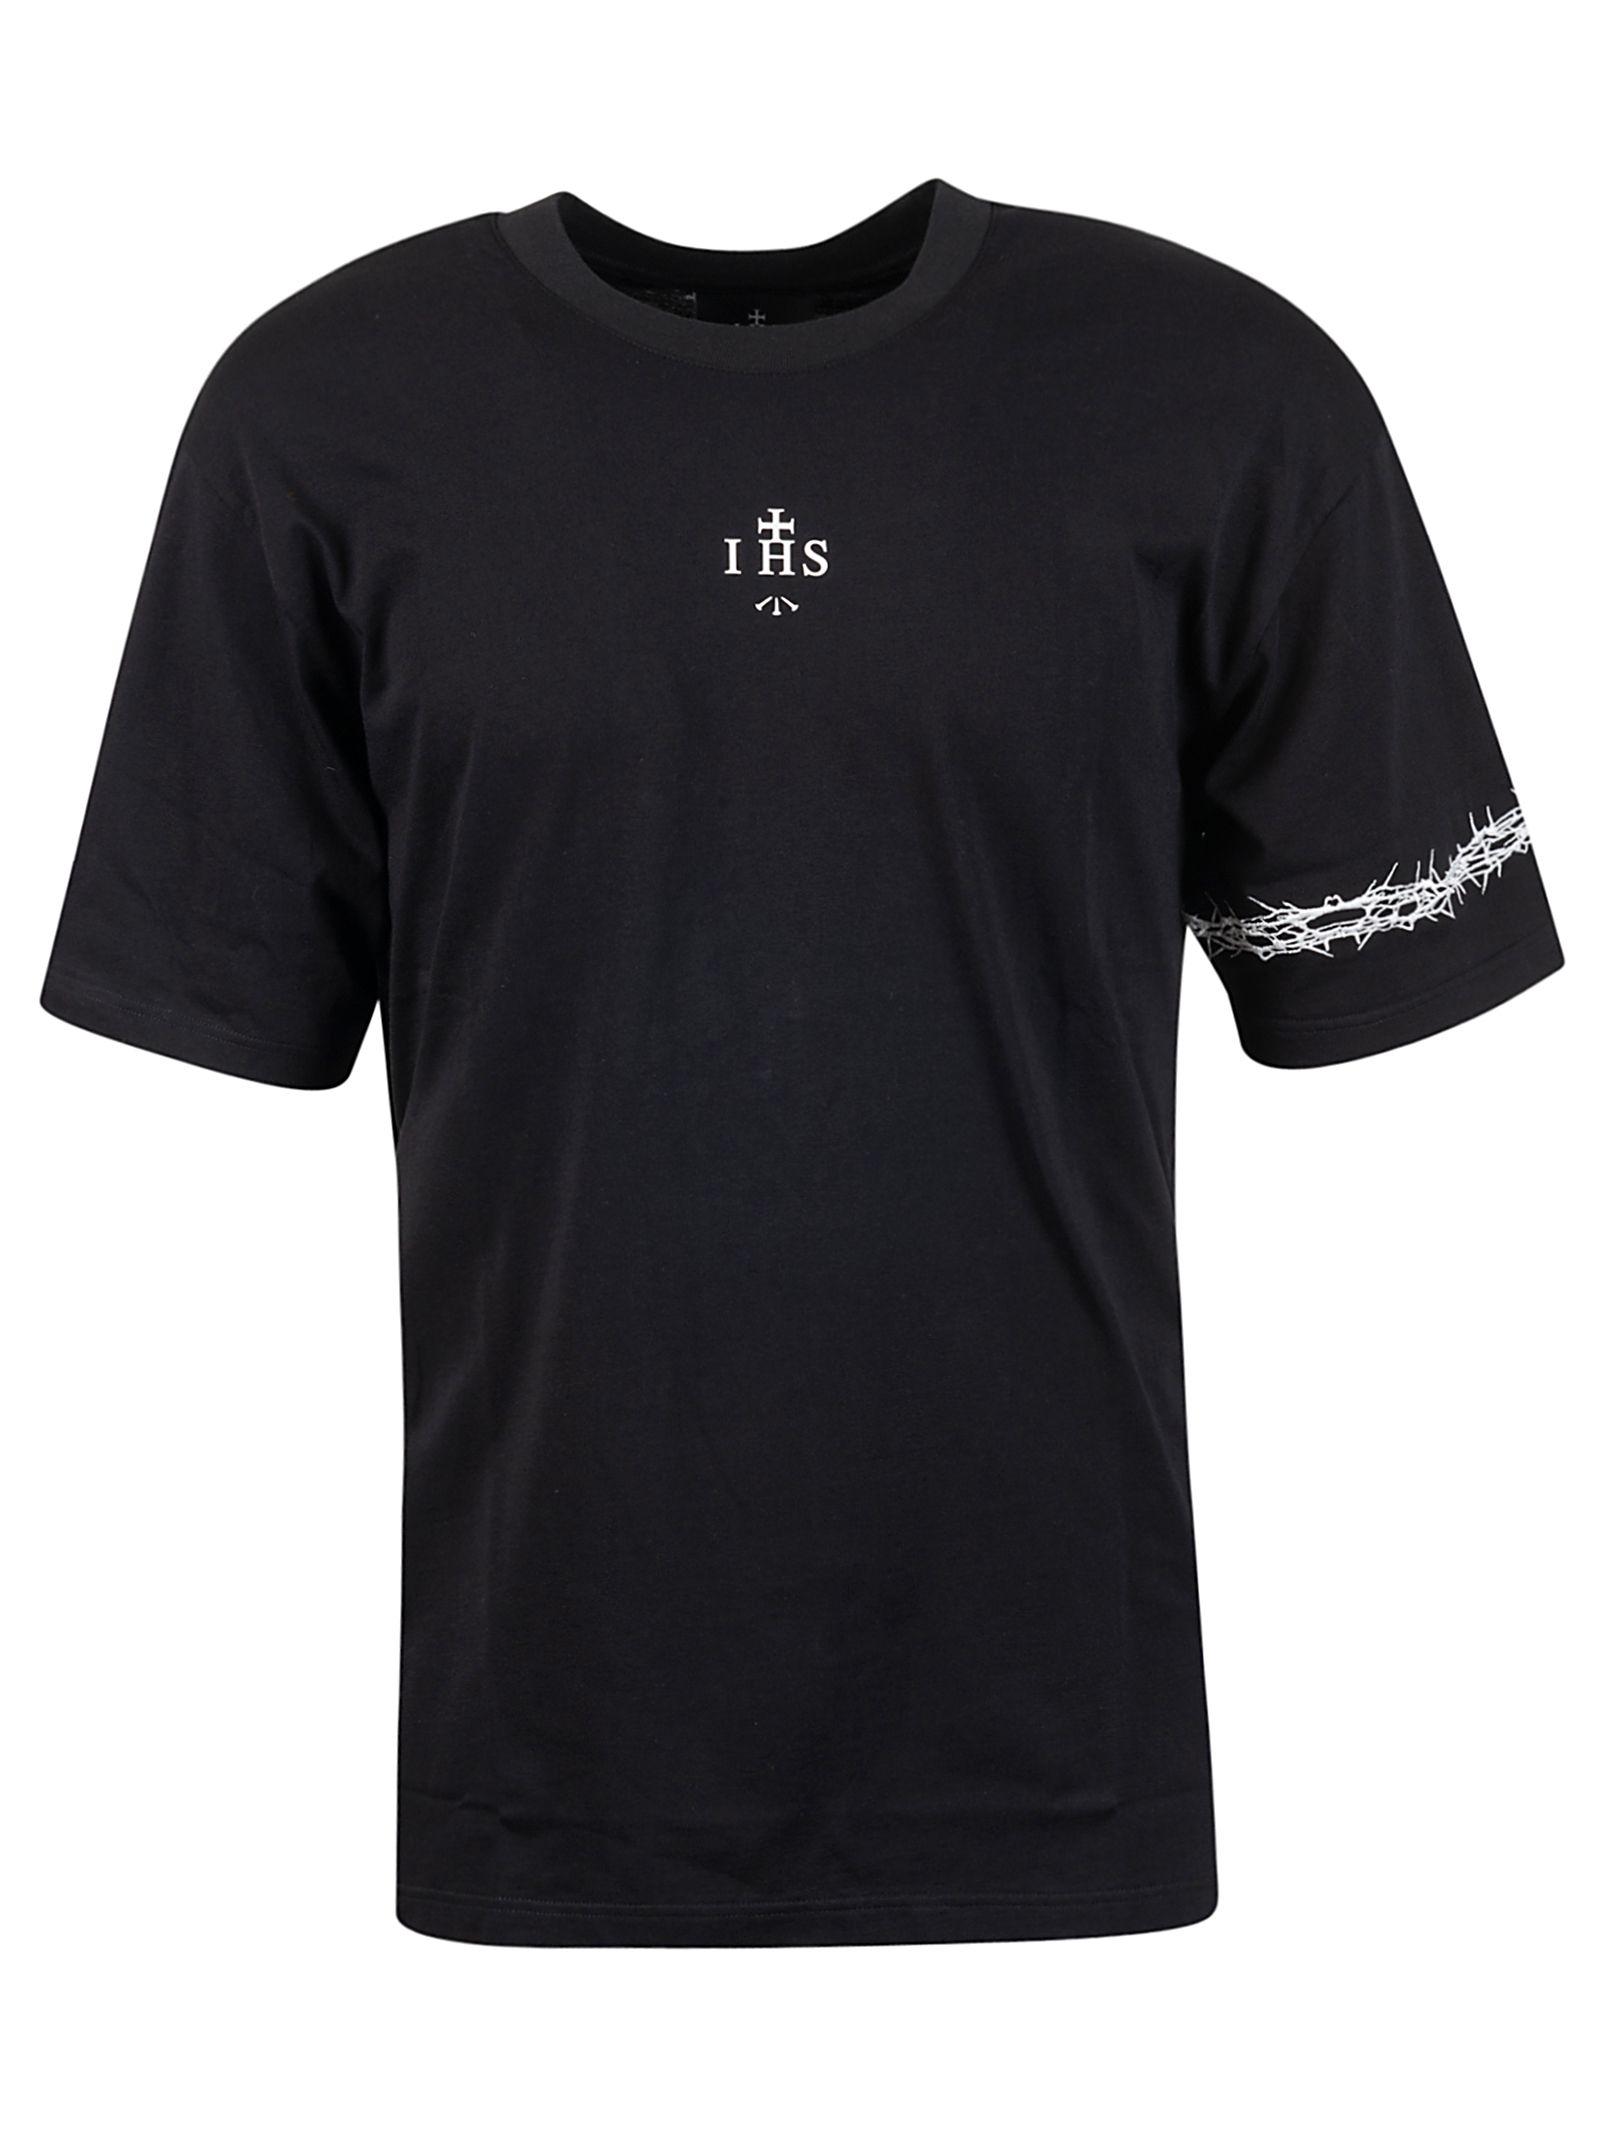 Ihs Black Cotton T-shirt